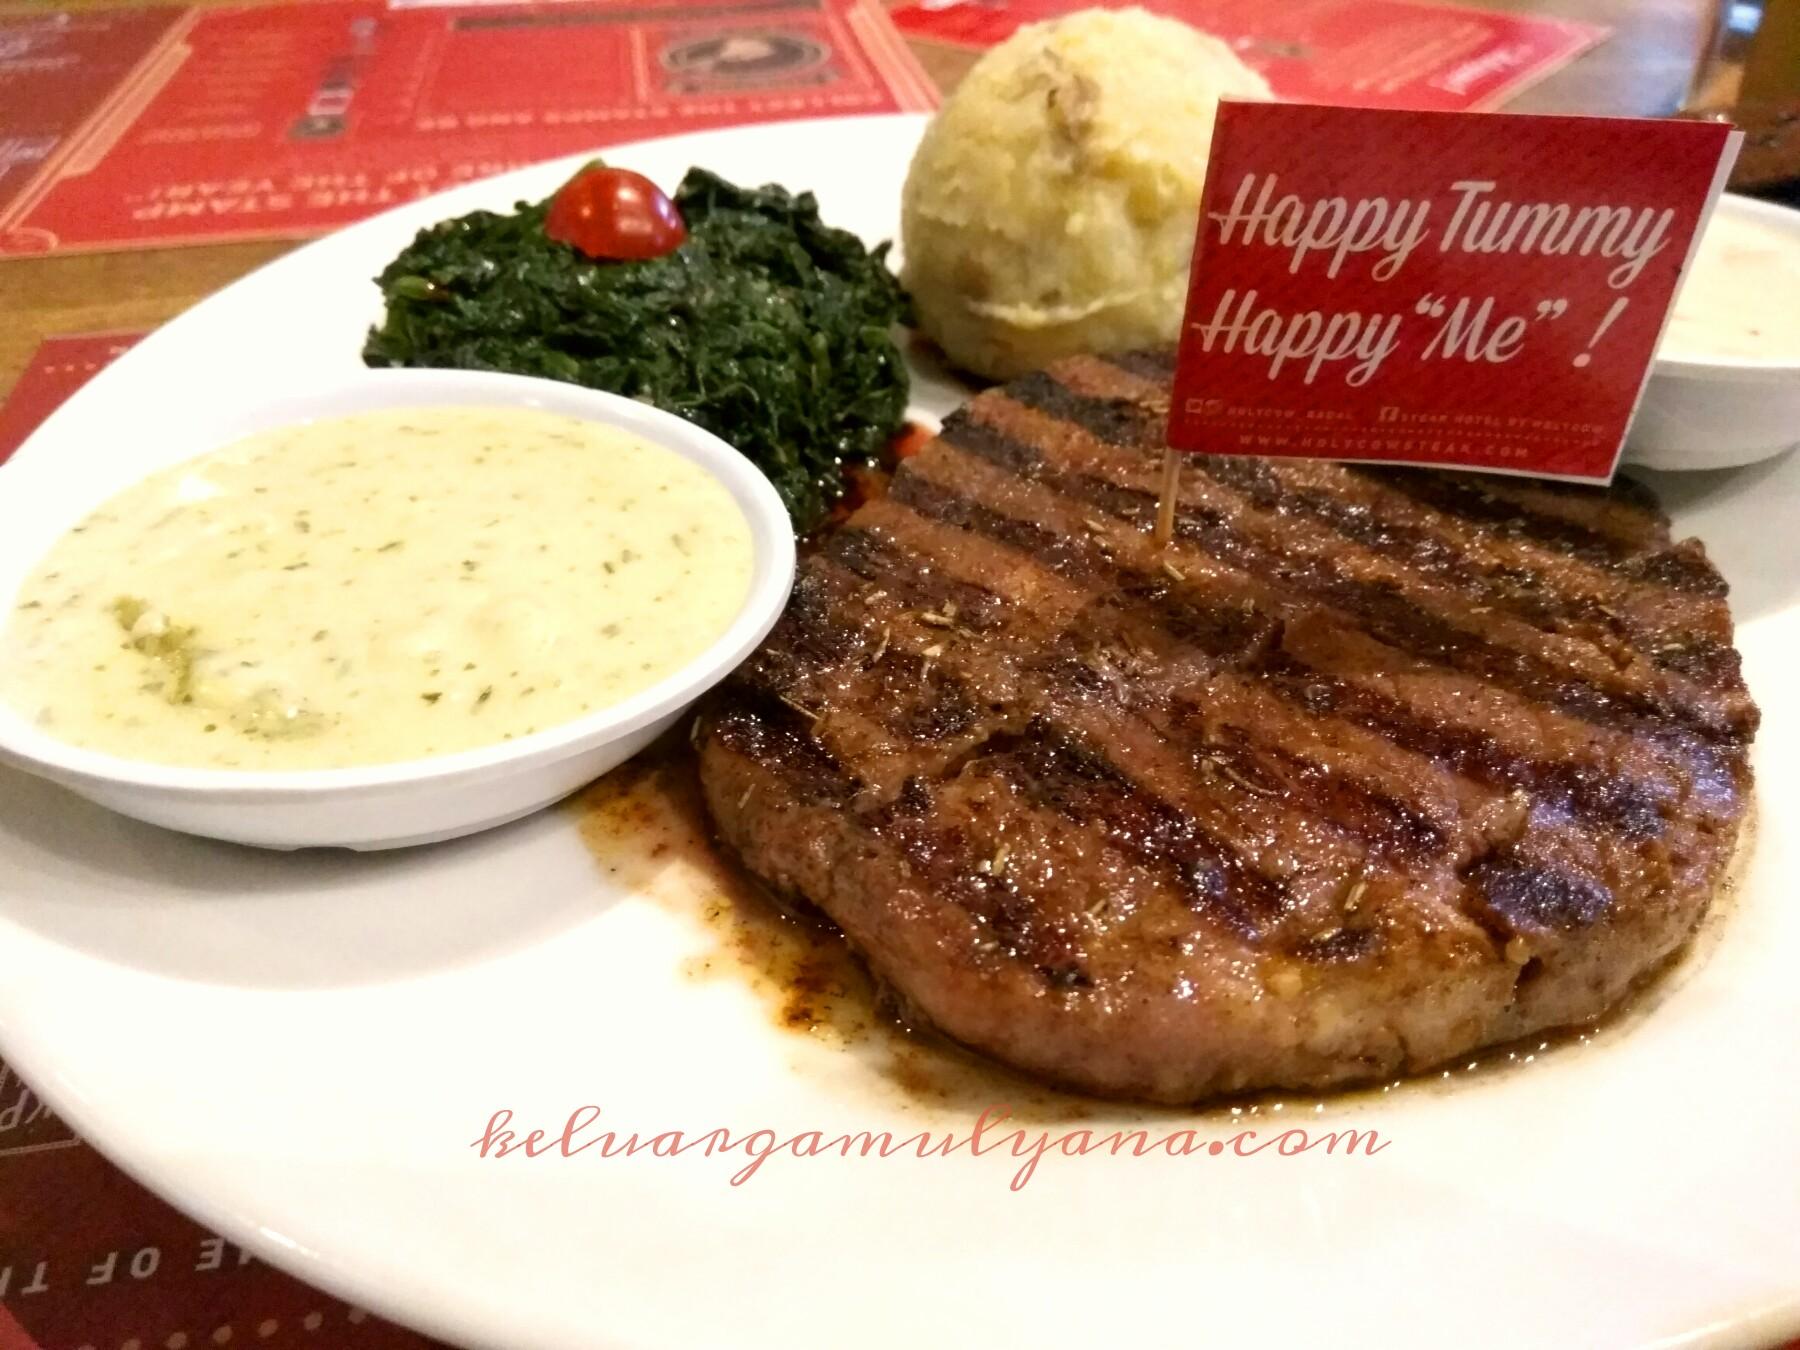 Steak hotel by holycow Tokusen Wagyu